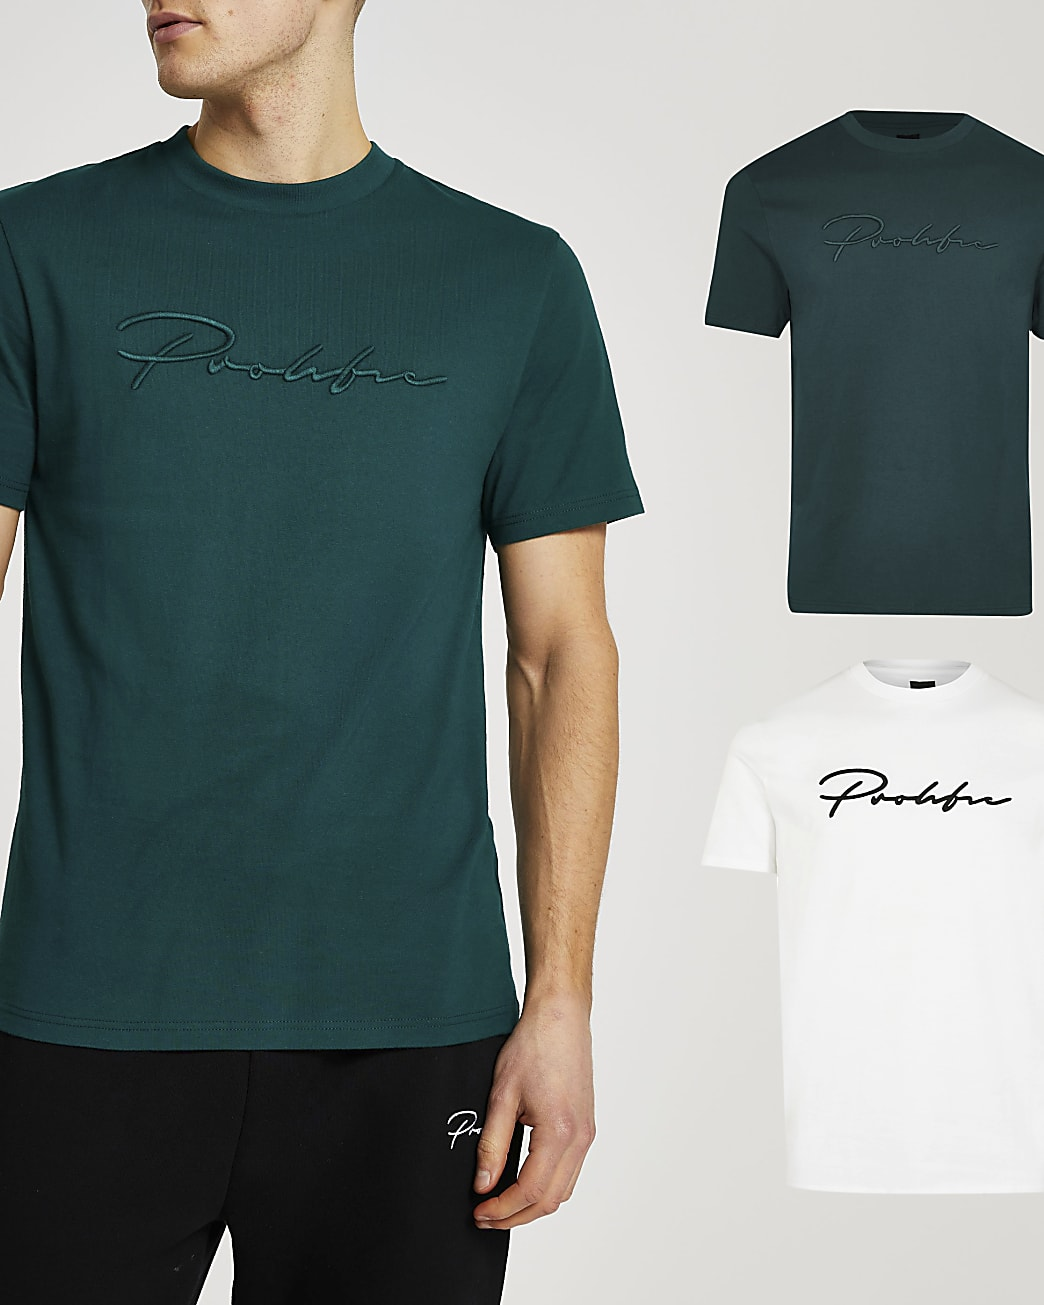 Prolific green slim fit t-shirt 2 pack